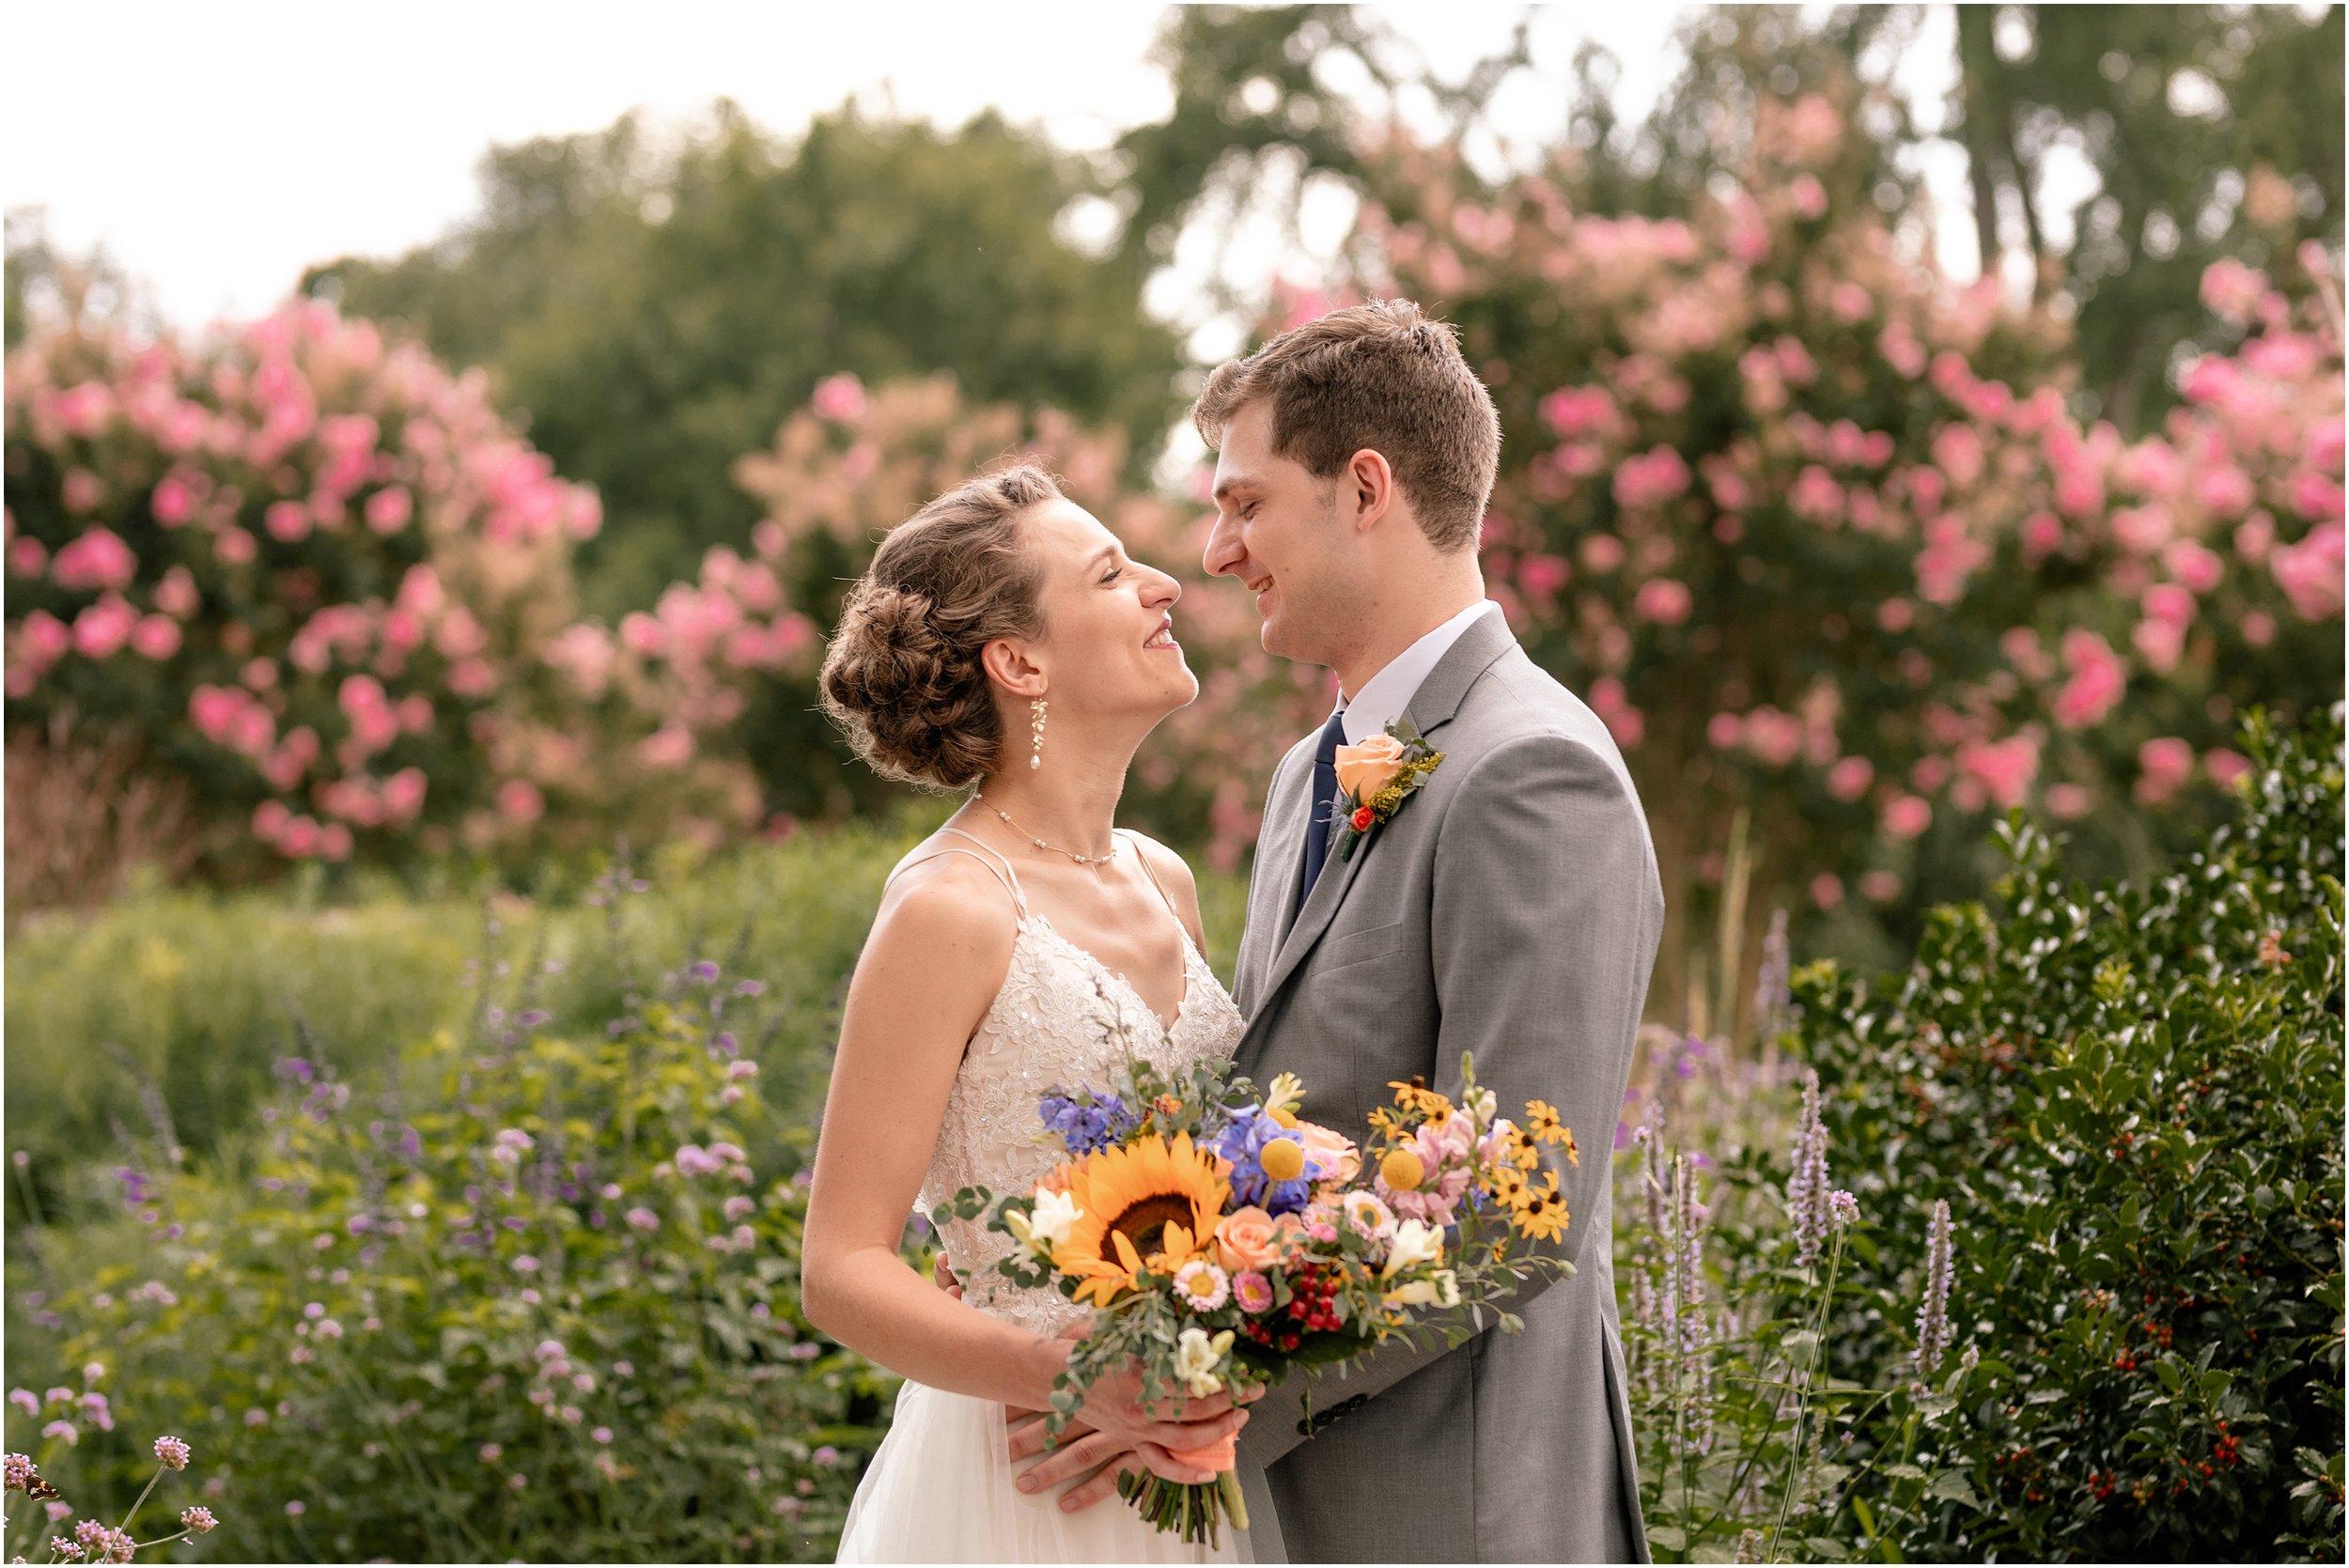 hannah leigh photography Cylburn Arboretum Wedding Baltimore, MD_3420.jpg